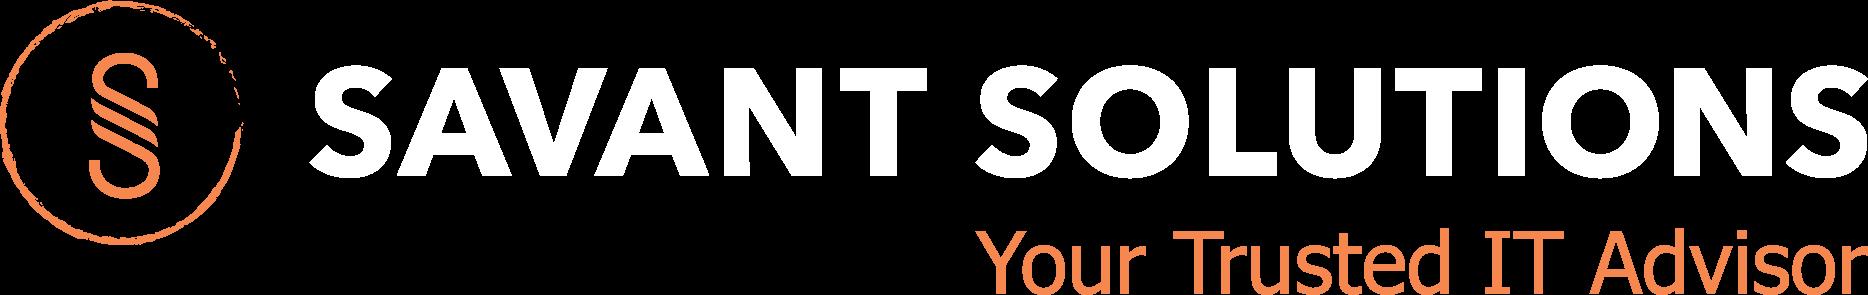 Savant Solutions